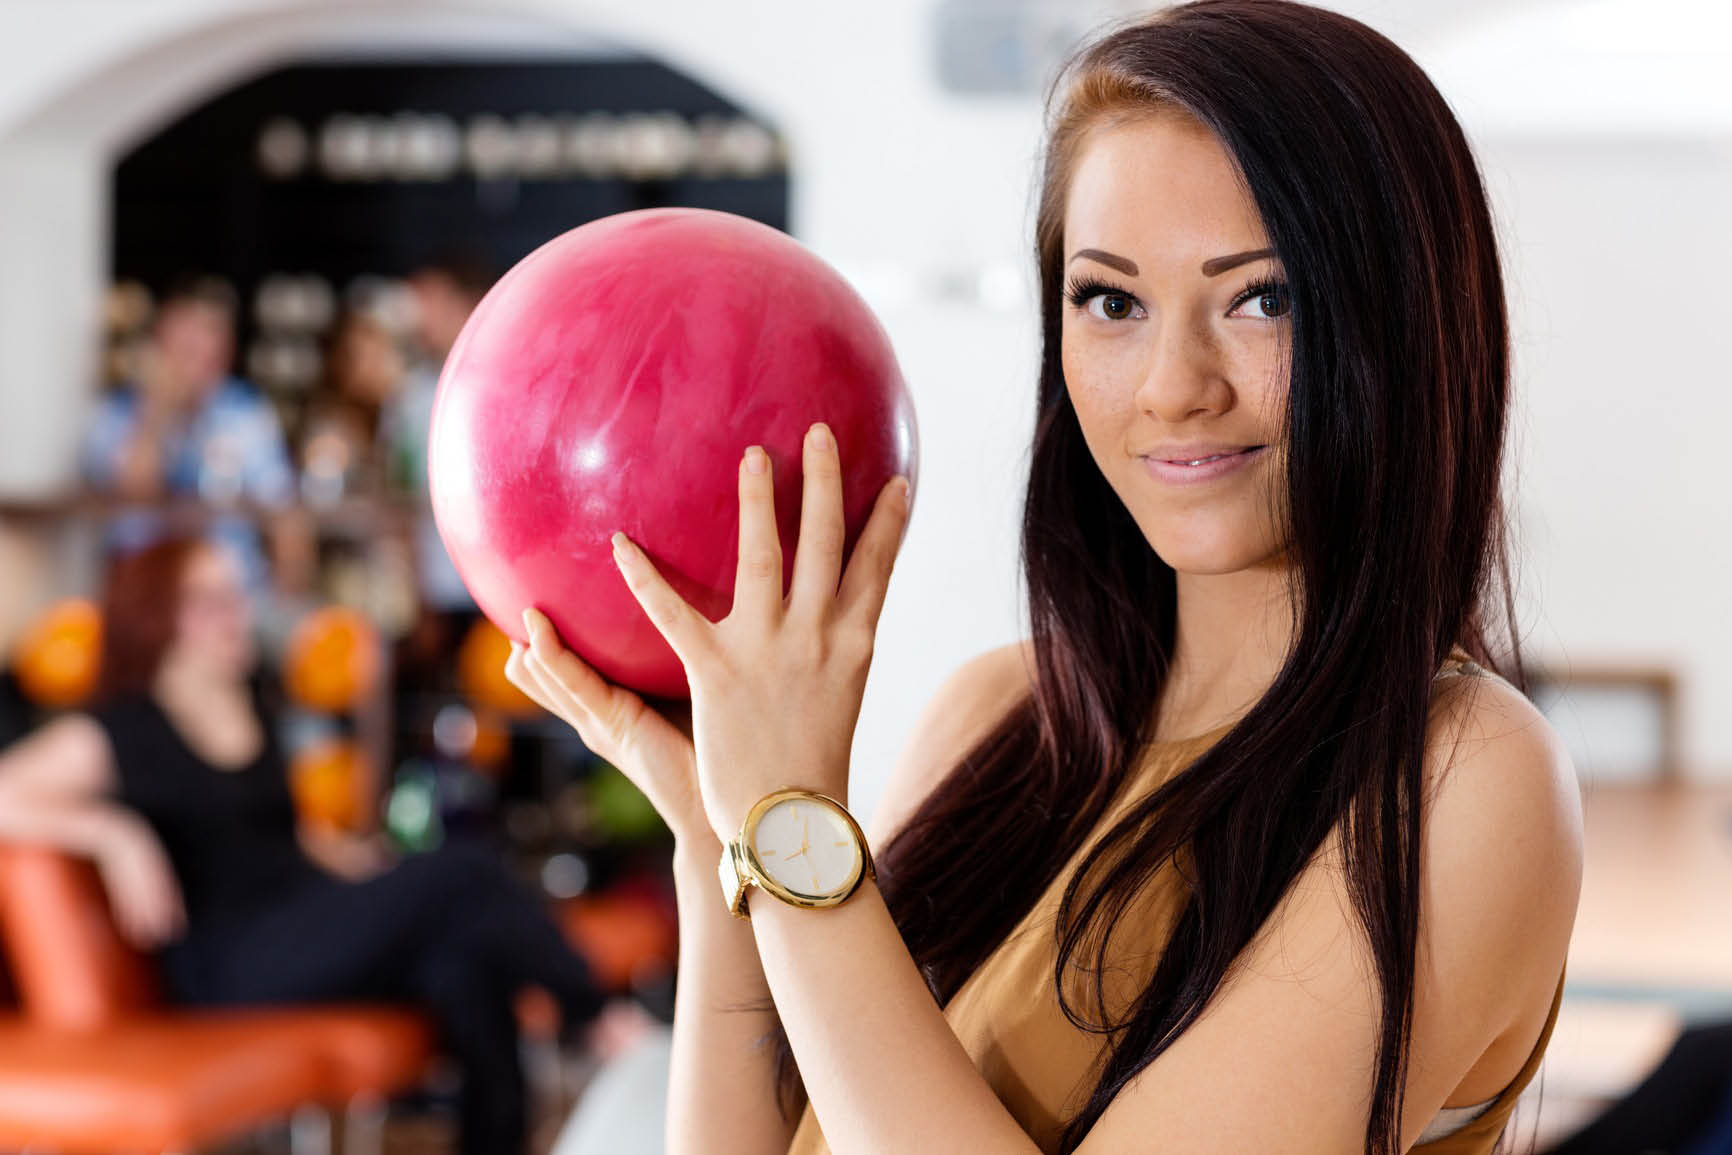 league bowling,palace bowling,bowling & entertainment,discount,deal,cheap bowling,bowling near me